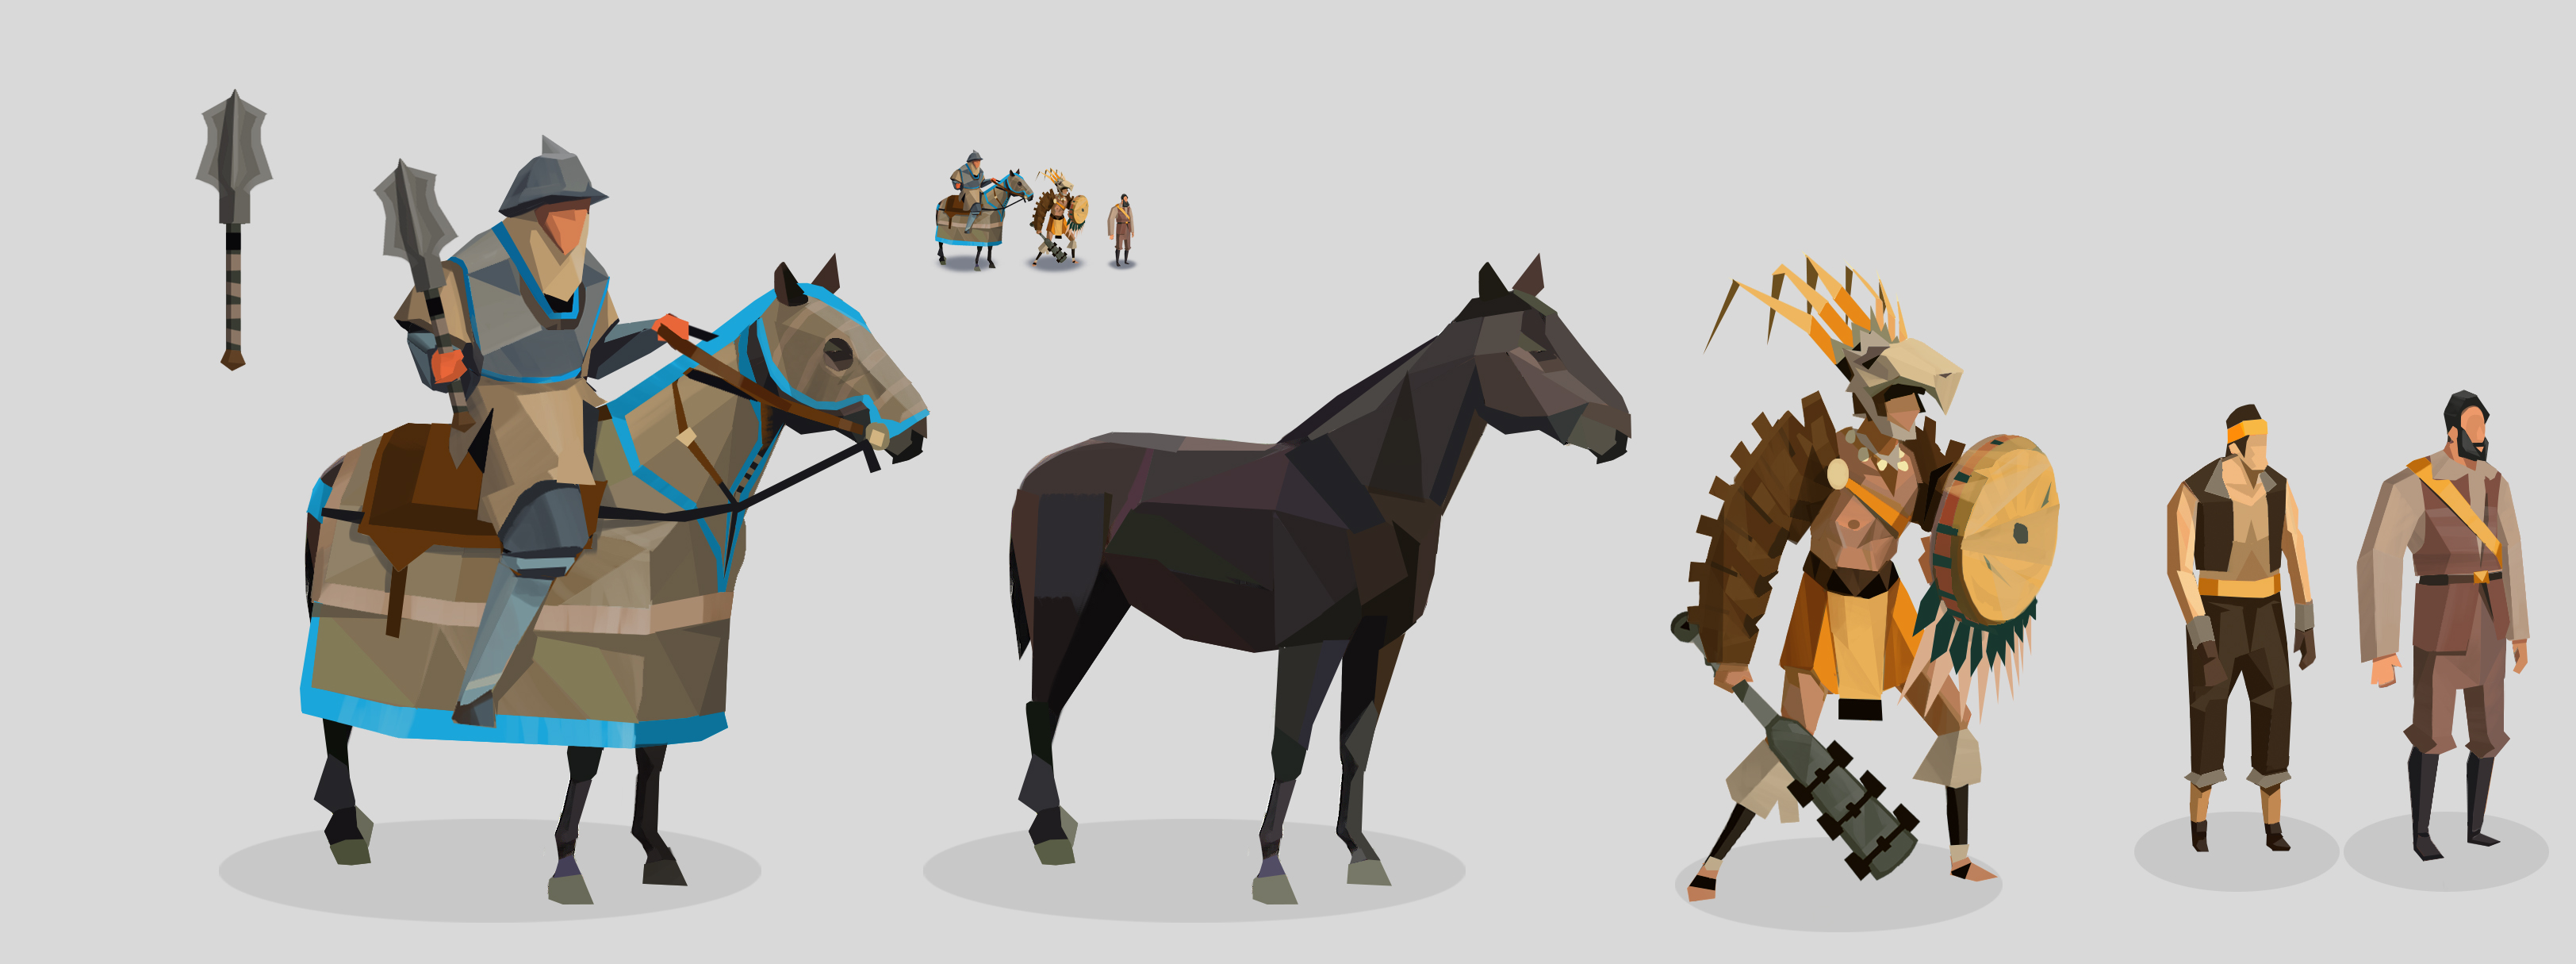 EmpiresApart_Concept_Characters.jpg